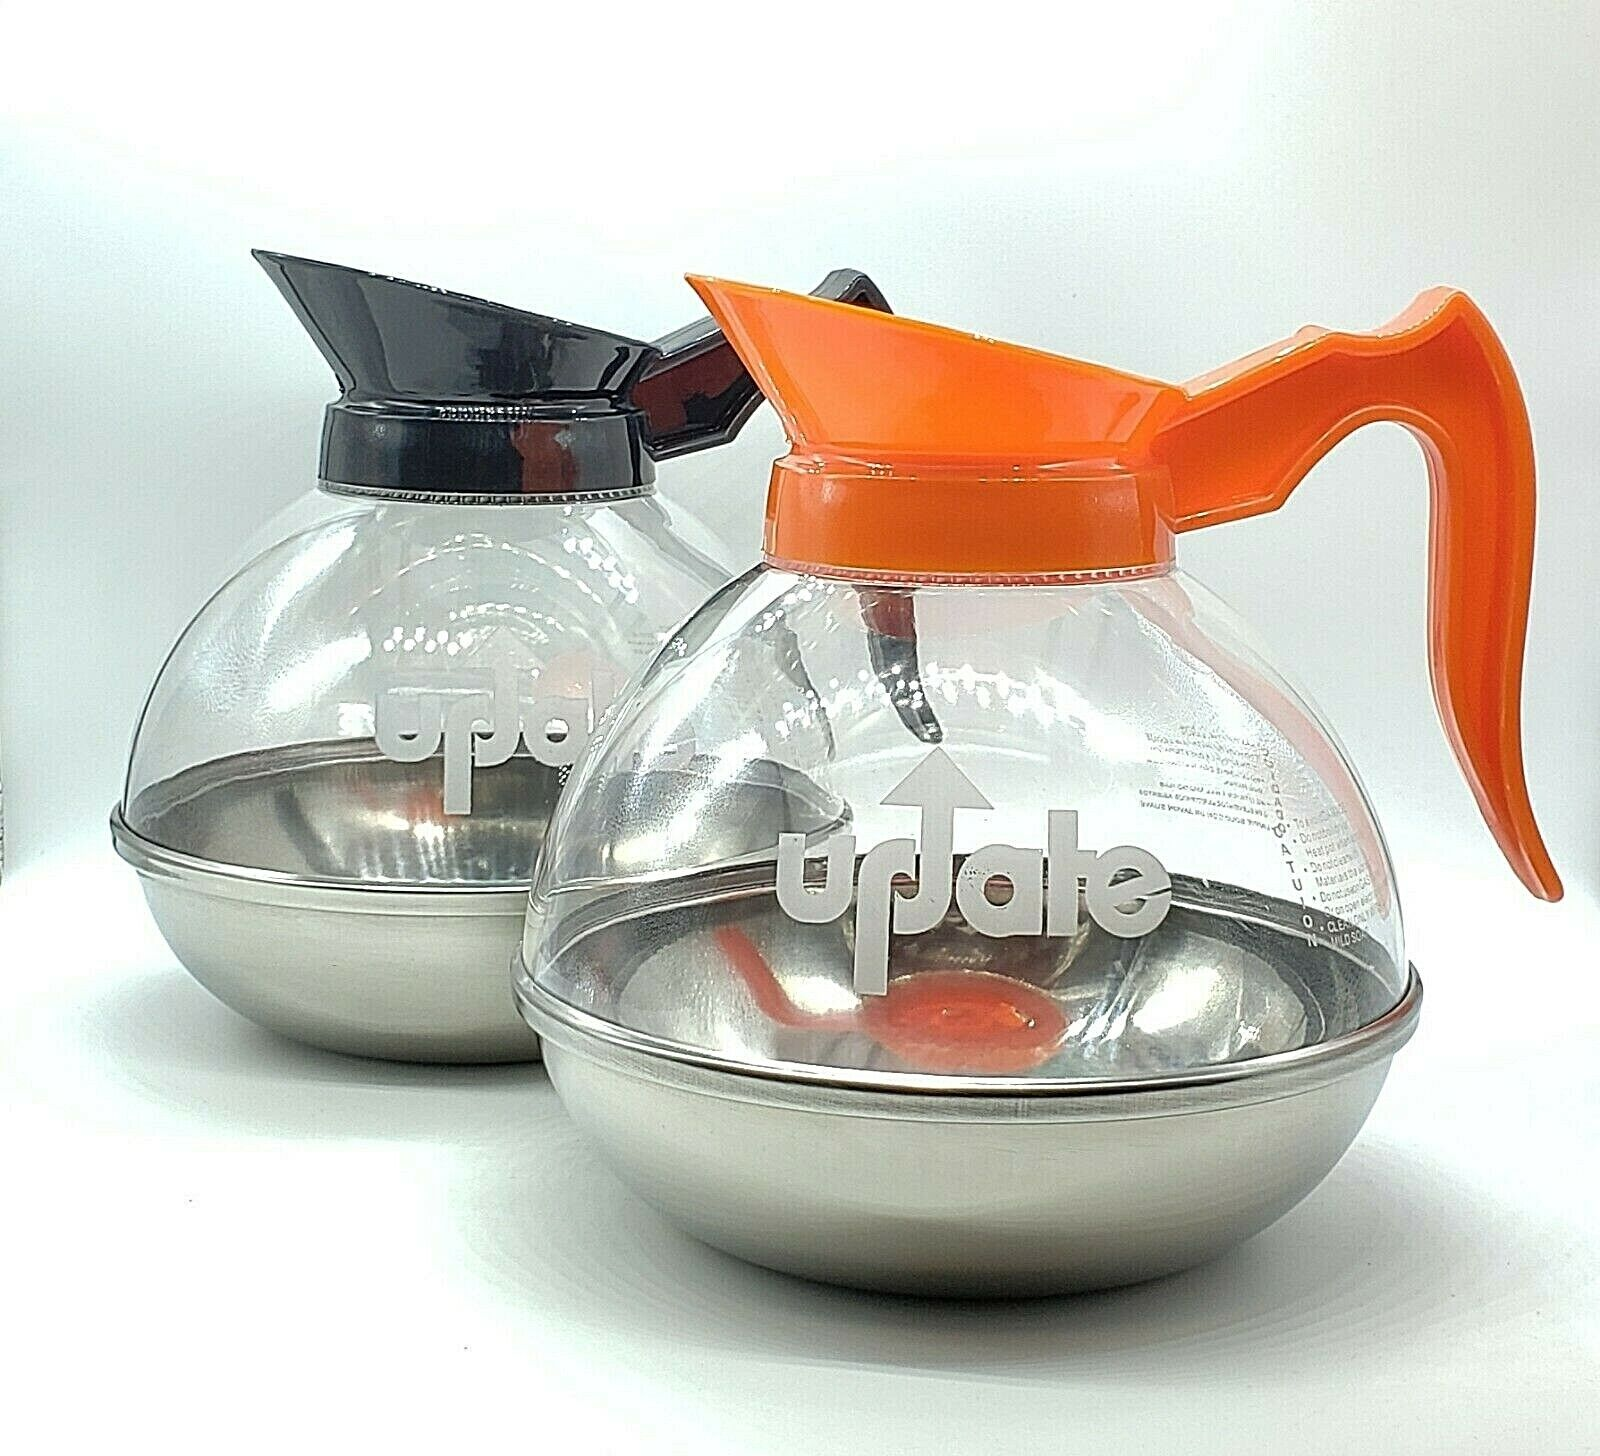 Update International 64 oz. Impact Resistant Coffee Decanter, Carafe Reg & Decaf Bar & Beverage Equipment